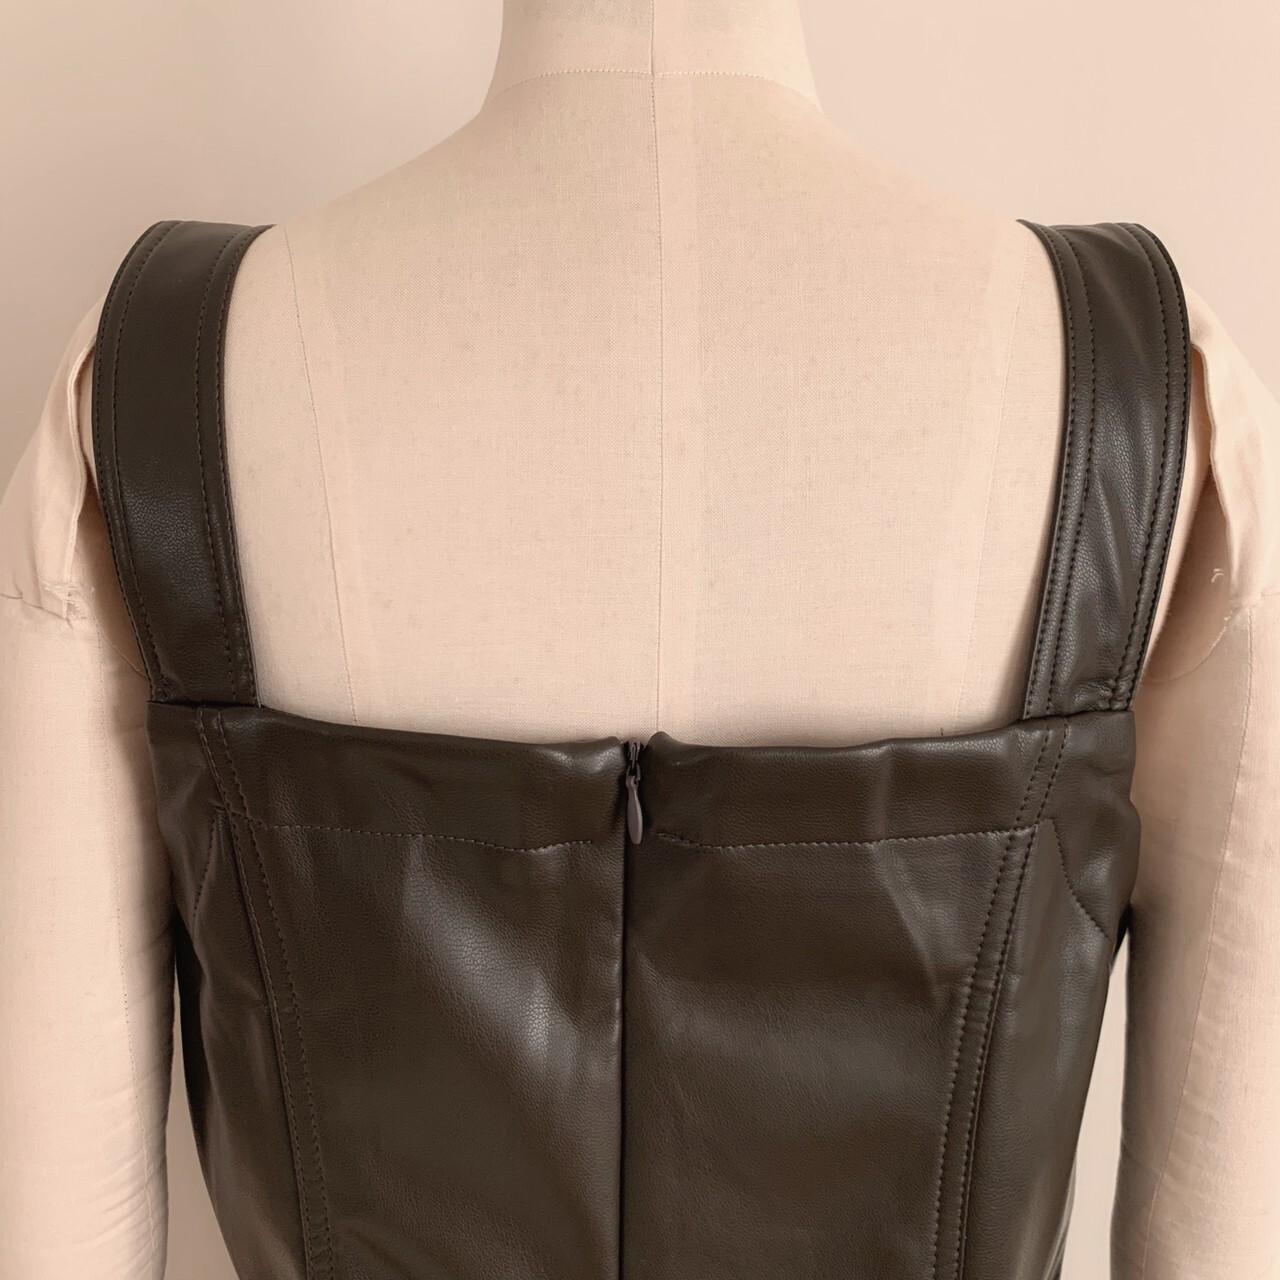 【meltie】leather bustier one-piece